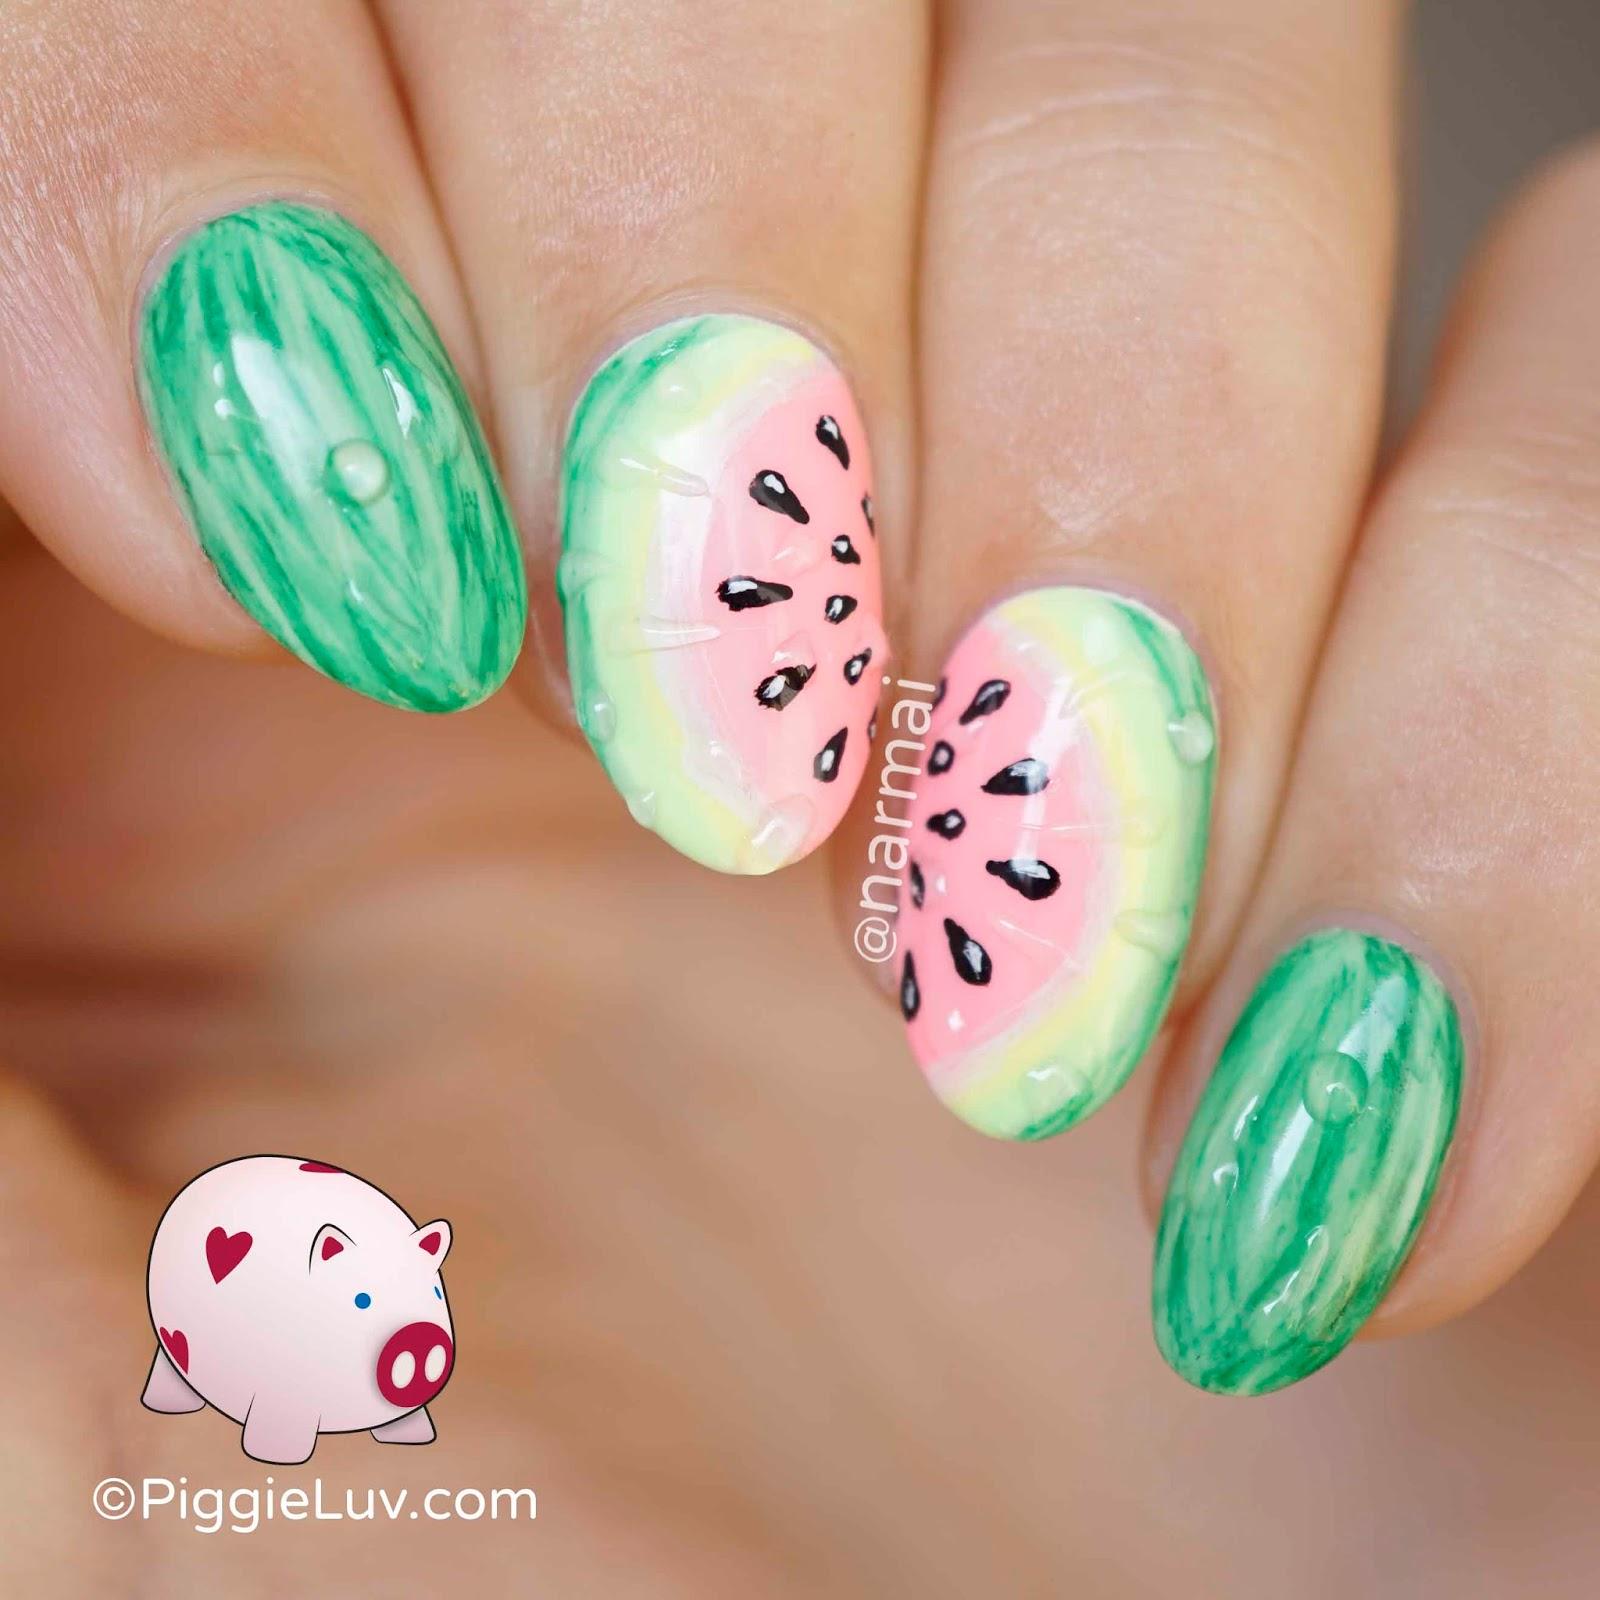 PiggieLuv: Juicy watermelon nail art